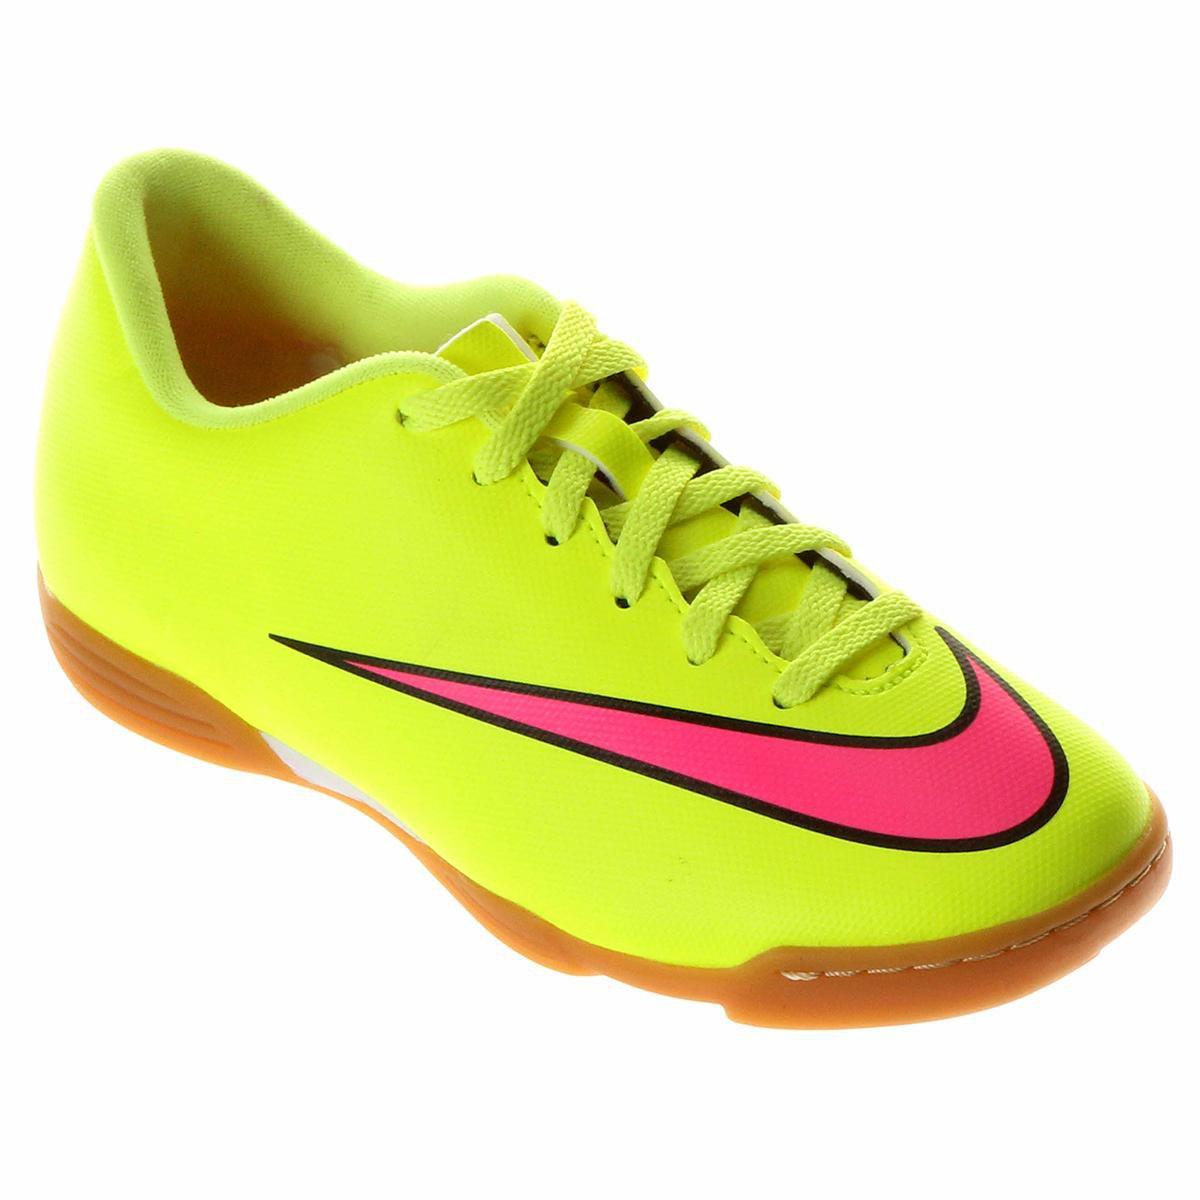 33c1b9bfd8 ... norway chuteira futsal infantil nike mercurial vortex 2 ic compre agora  netshoes 80460 7f844 ...